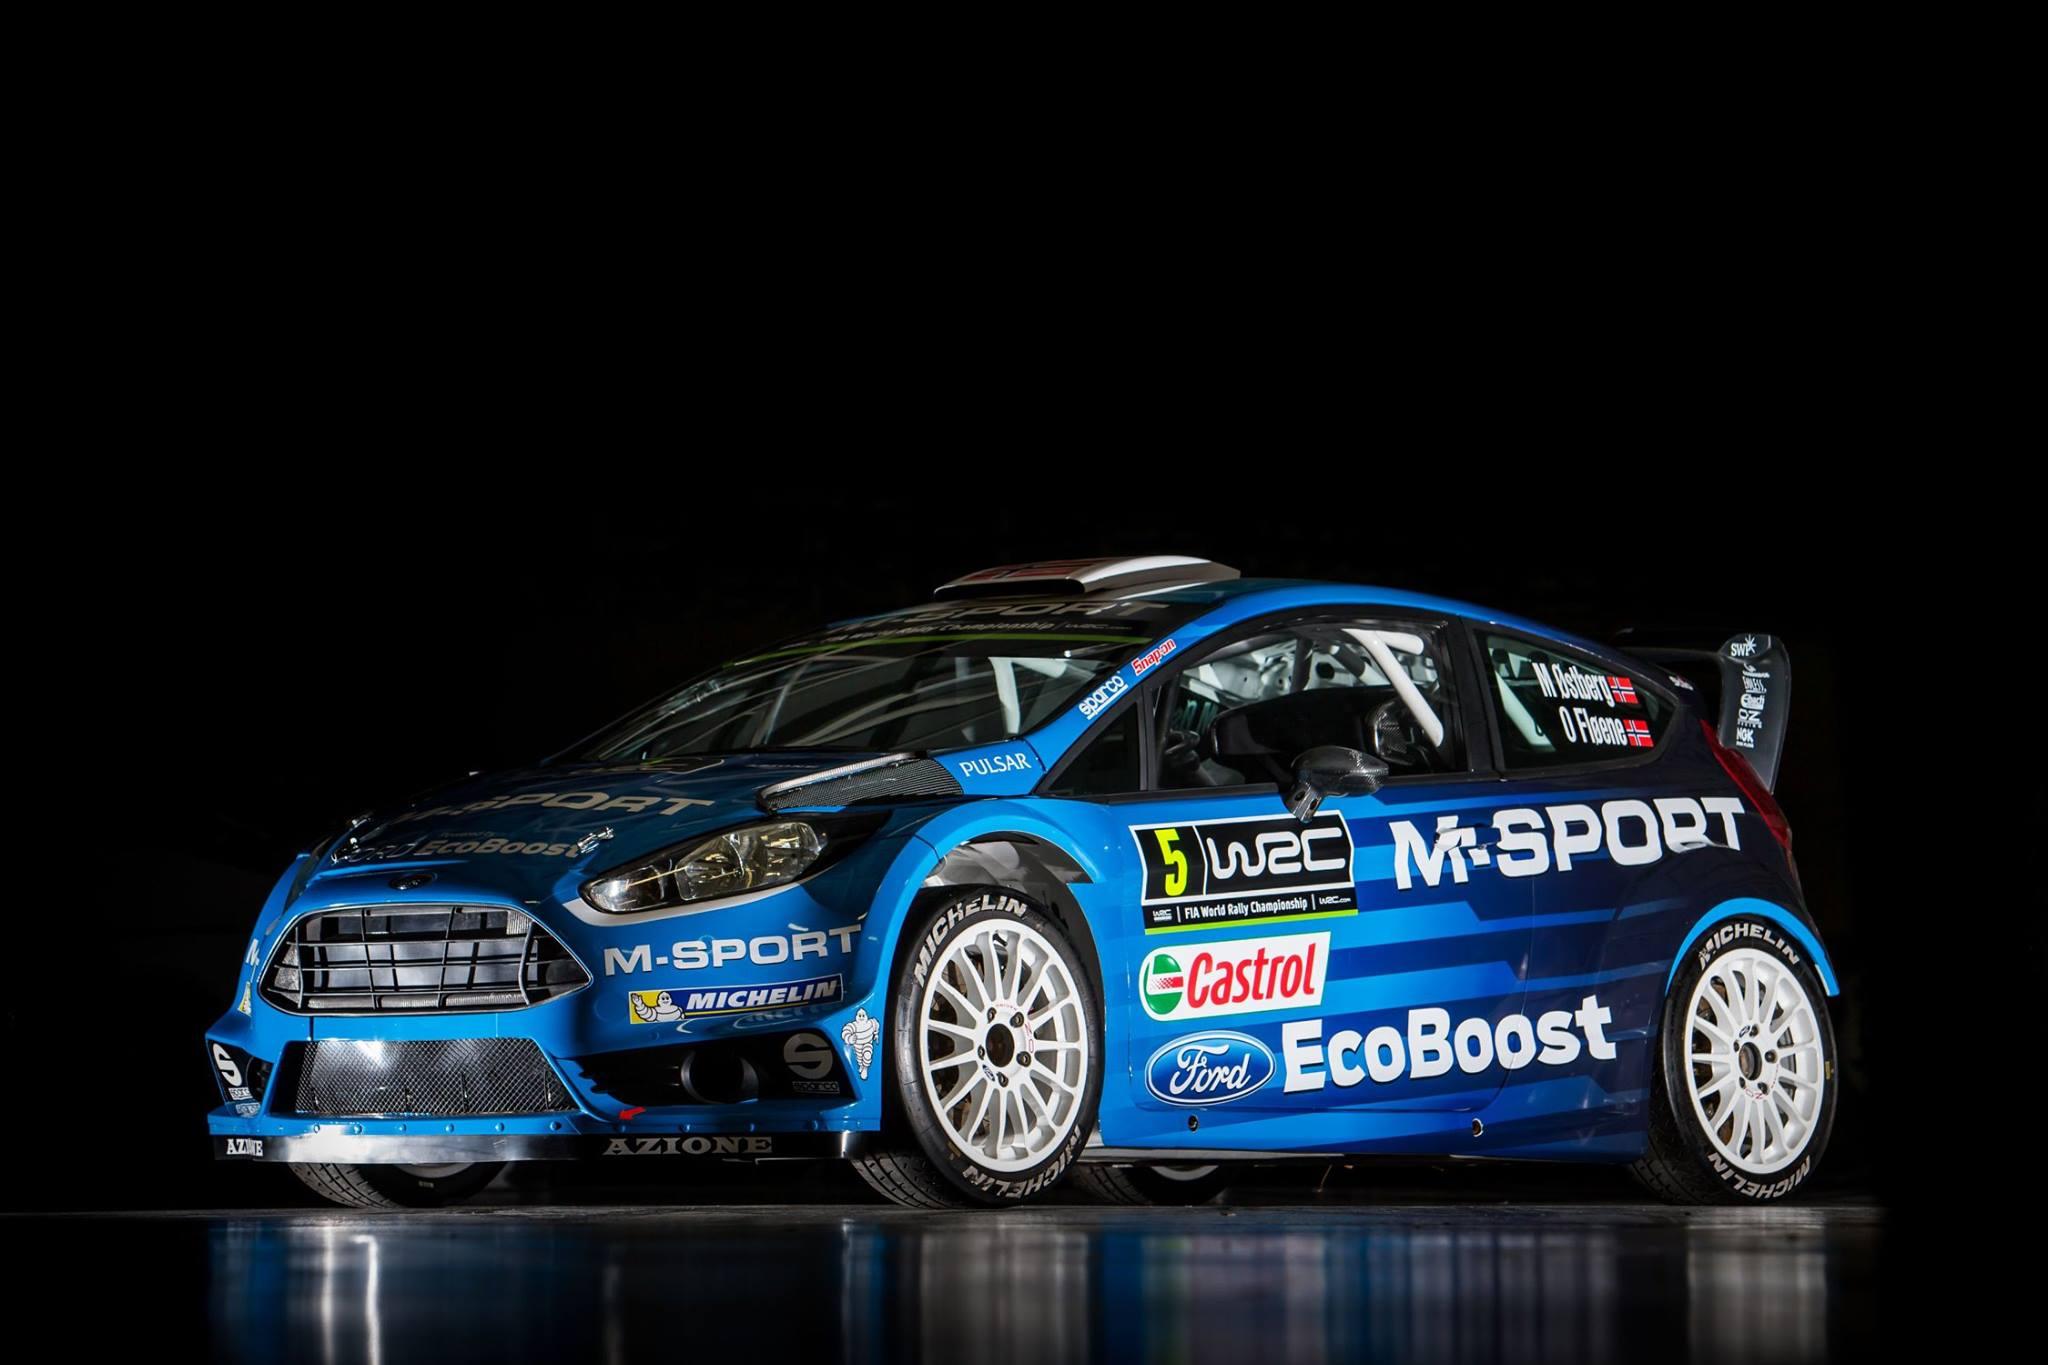 Ford Fiesta WRC - M-Sport - WRC 2016